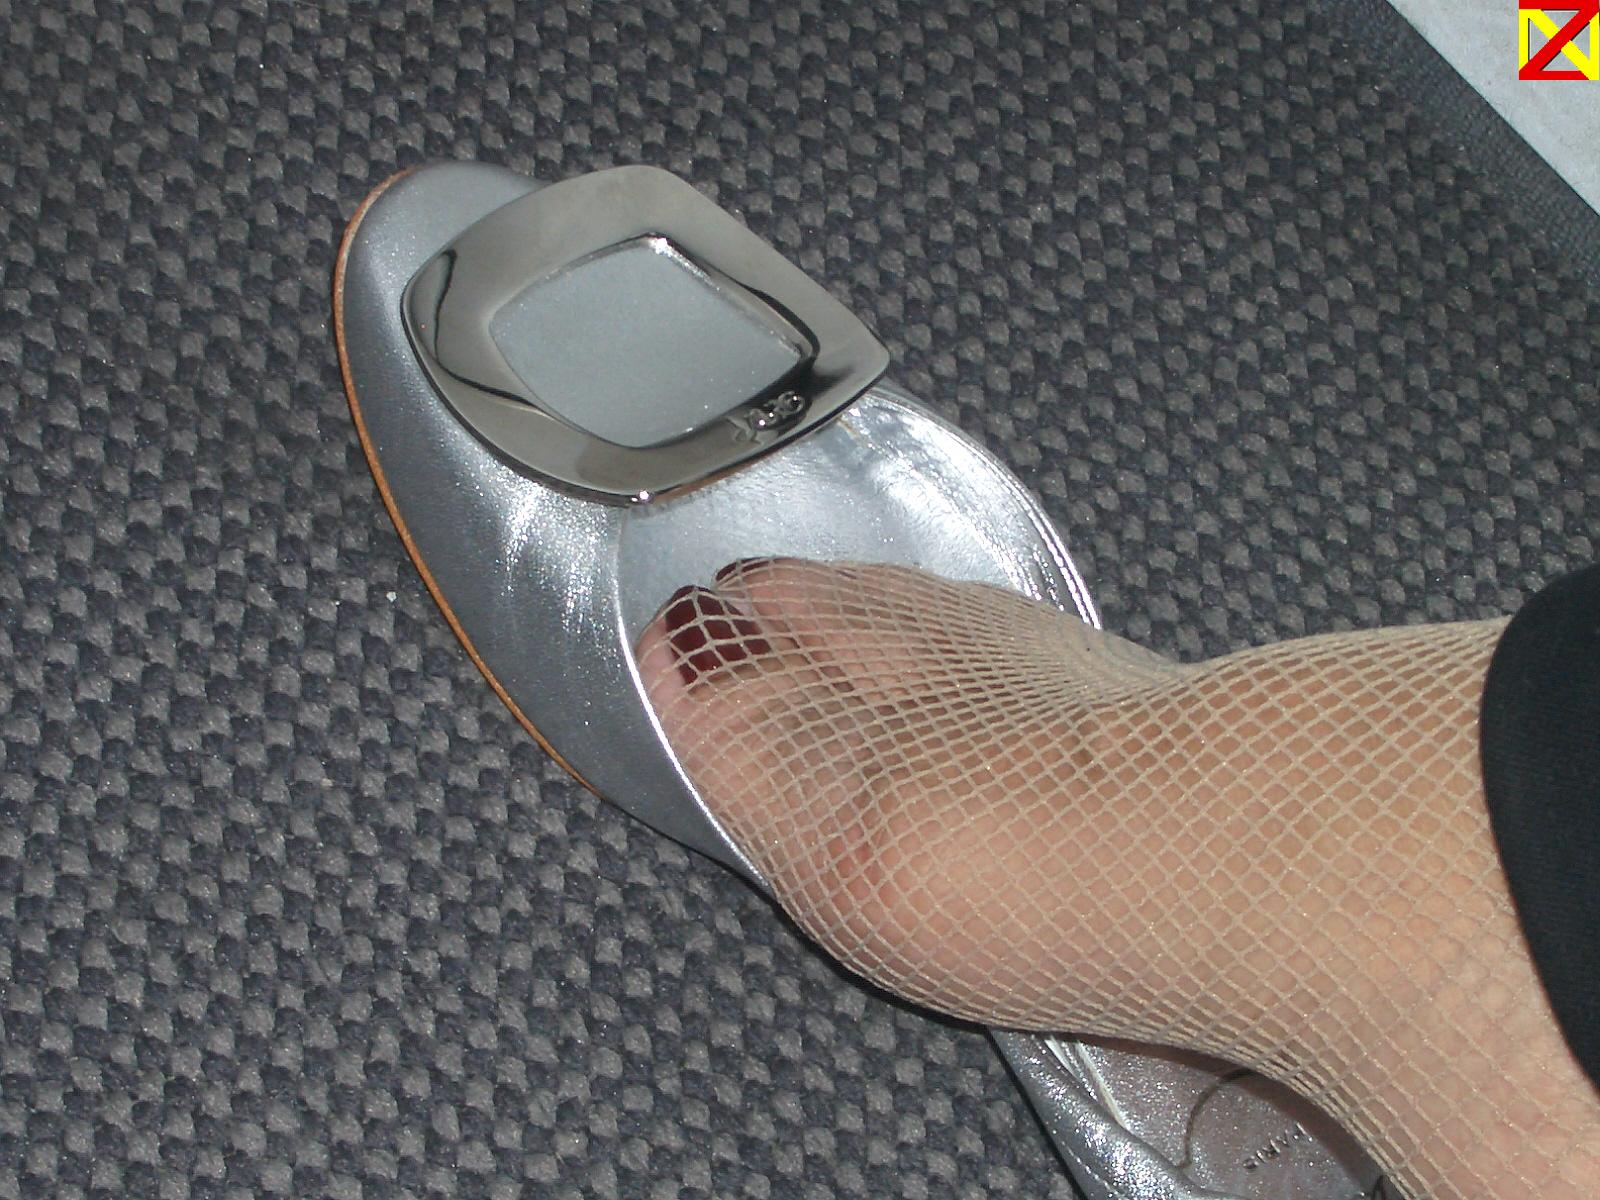 Fondos De Pantalla Ballet Espana Mujer Sexy Pies Medias Nina Plata Mujer Espana Bailarina Zapatos Dedo Del Pie Ametralladora Polaco Red De Pesca Manguera Pisos Pantalones Espanol Plata Tartas Mezclilla Pedicure